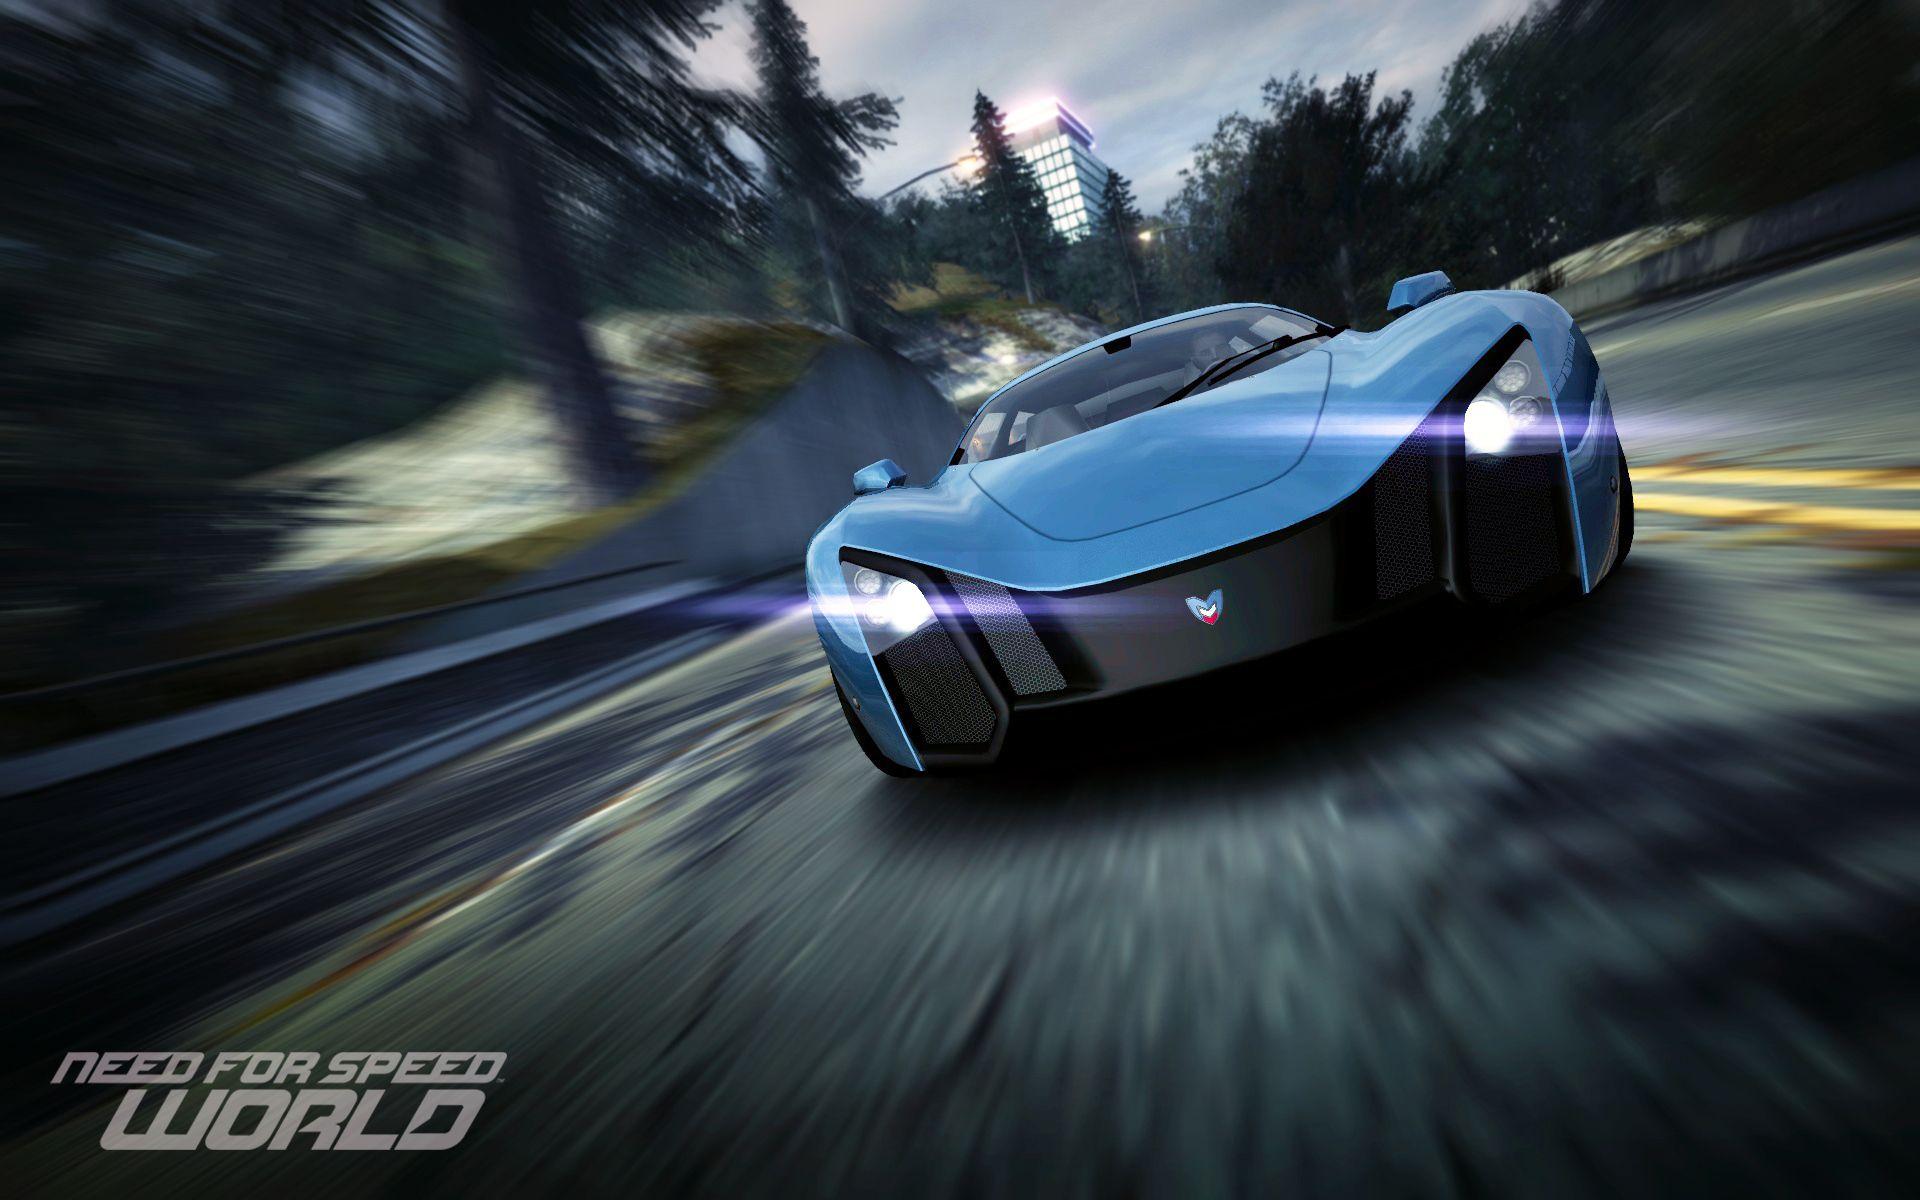 3e783bb175665ba64881db6fb9529222 Astounding Bugatti Veyron Need for Speed World Cars Trend